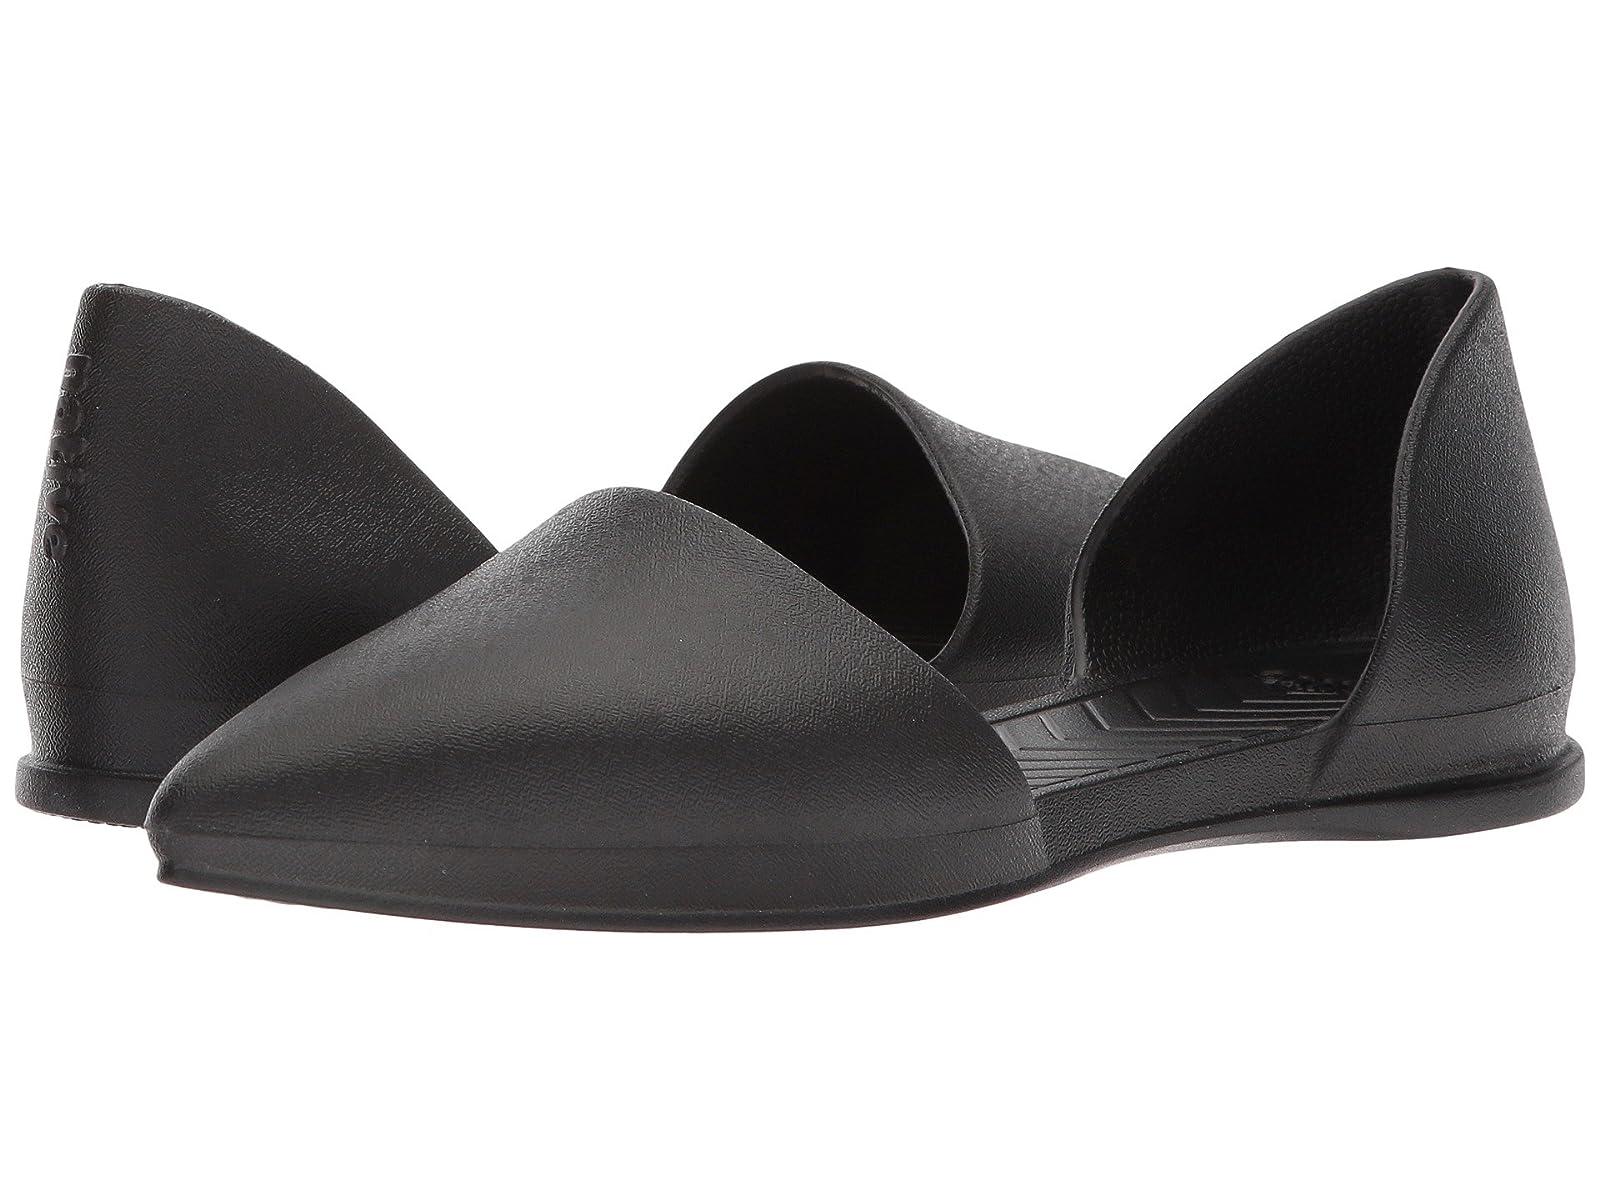 Native Shoes AudreyAtmospheric grades have affordable shoes